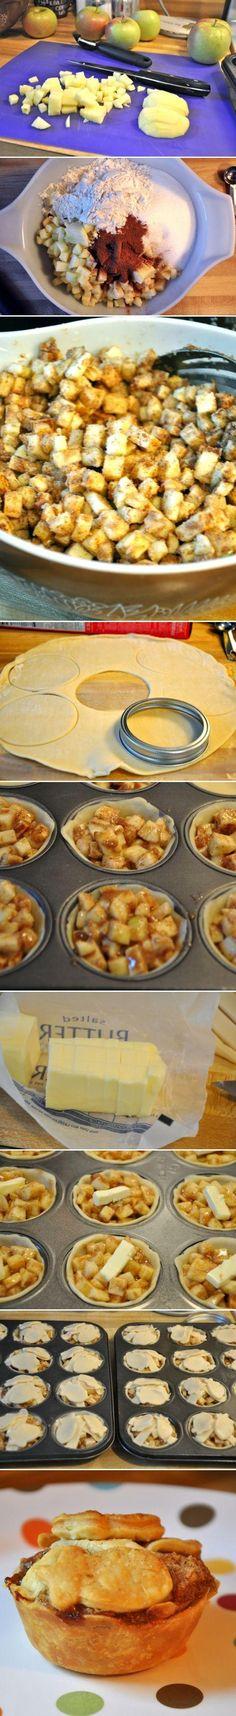 DIY Mini Apple Pie